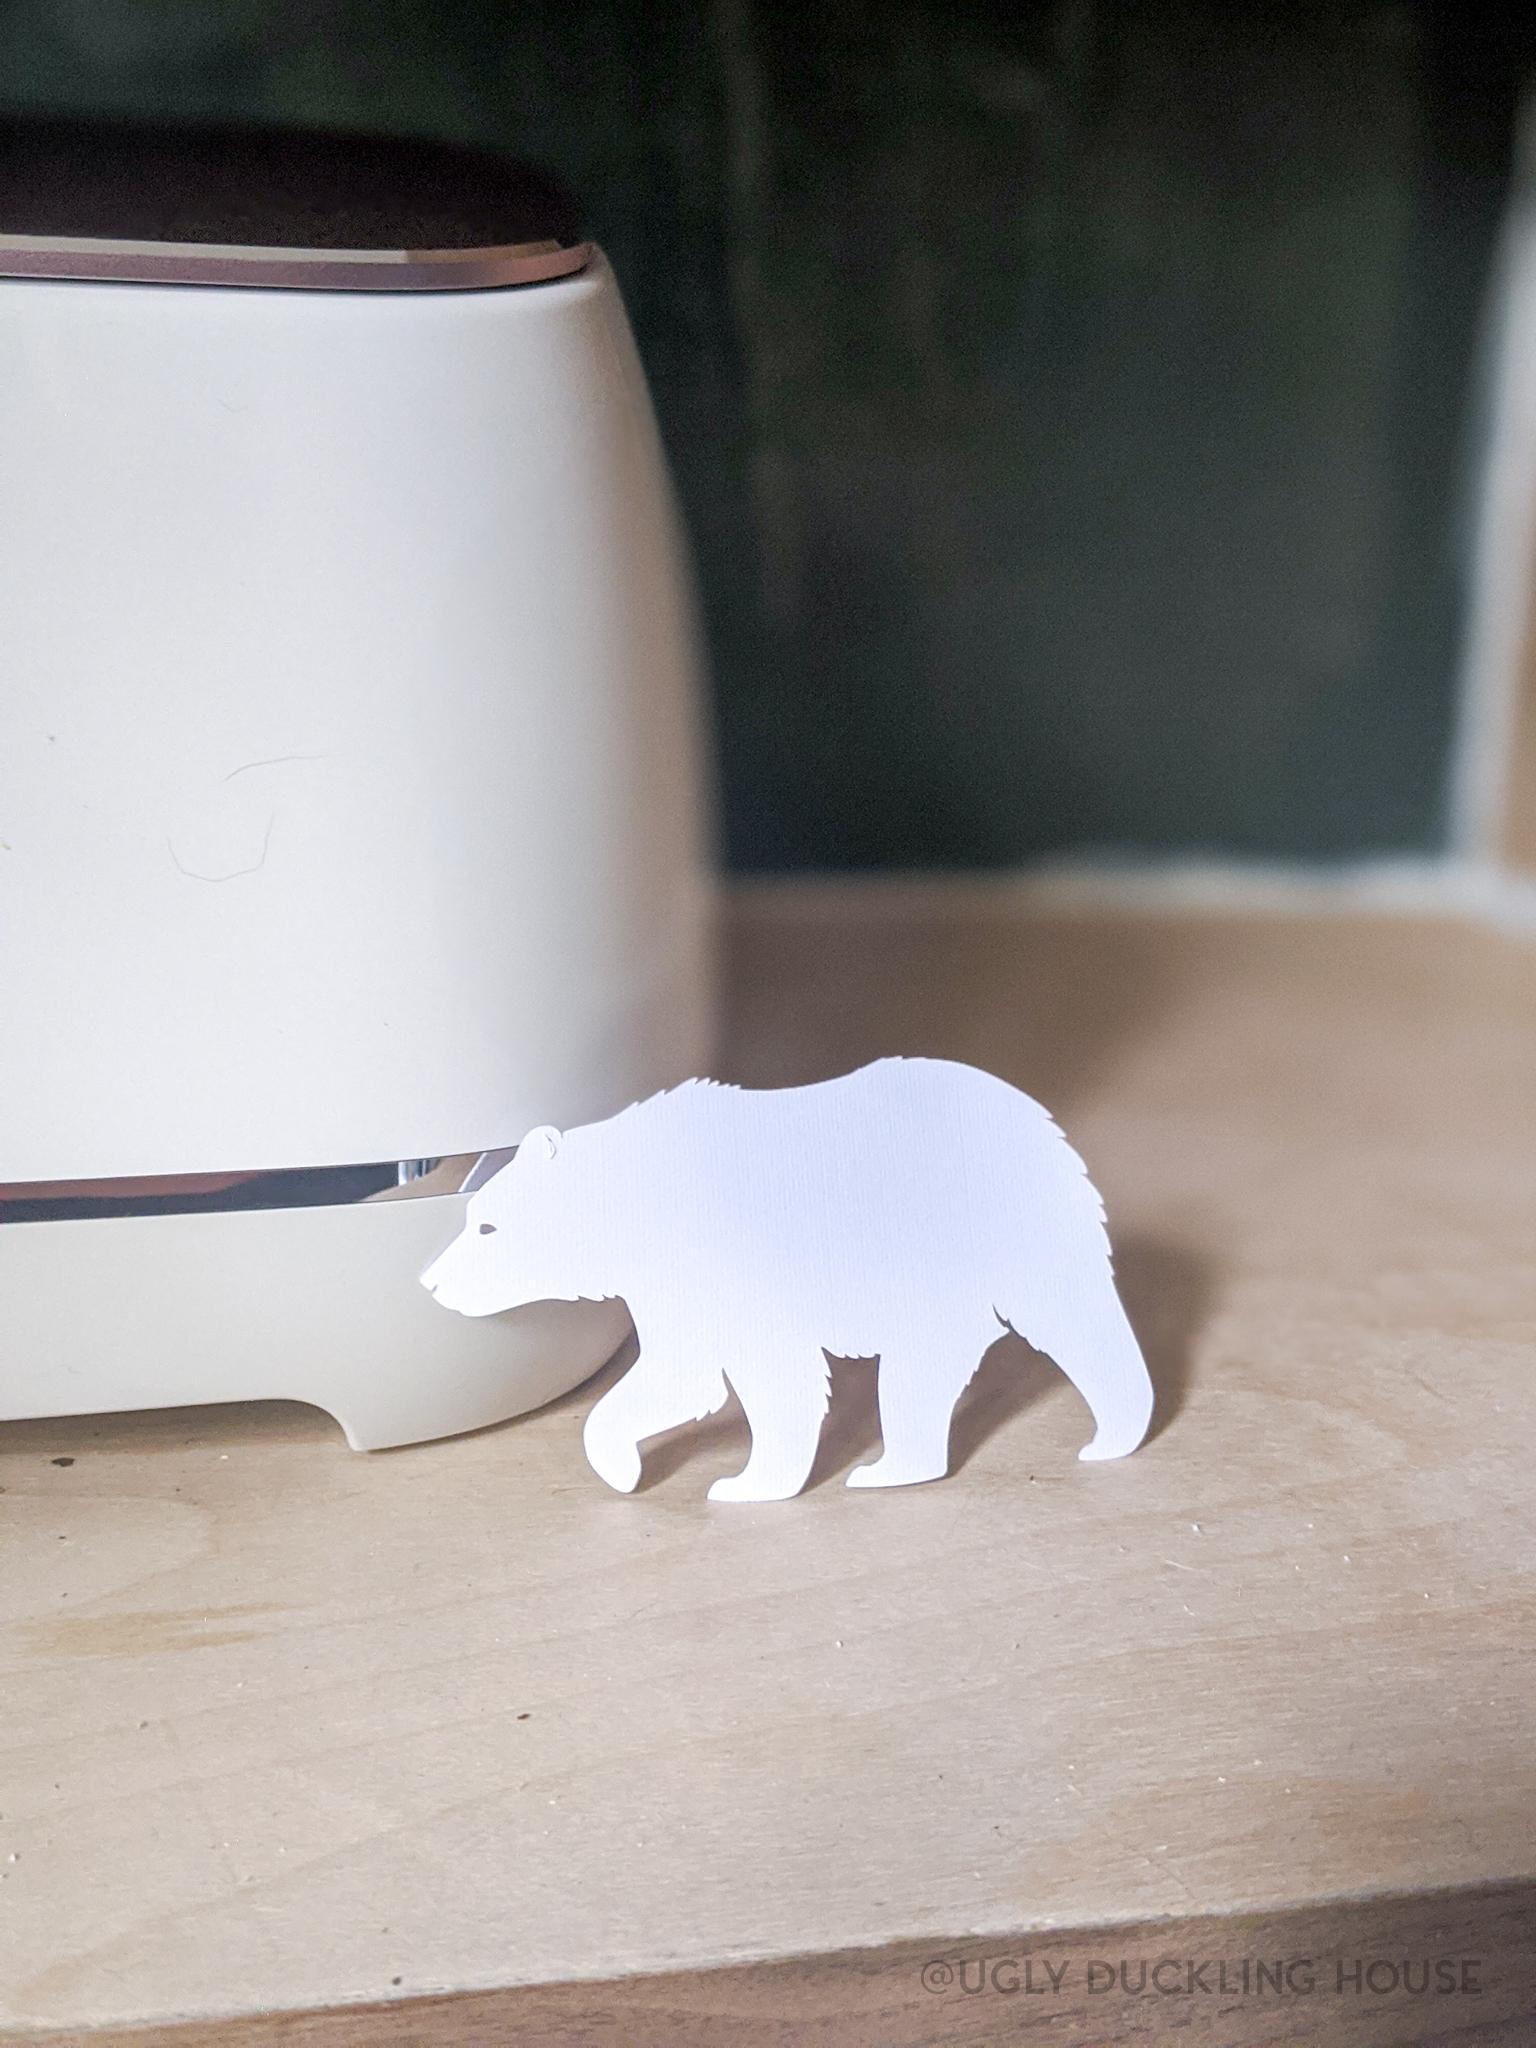 my first test piece was a little bear as part of setup